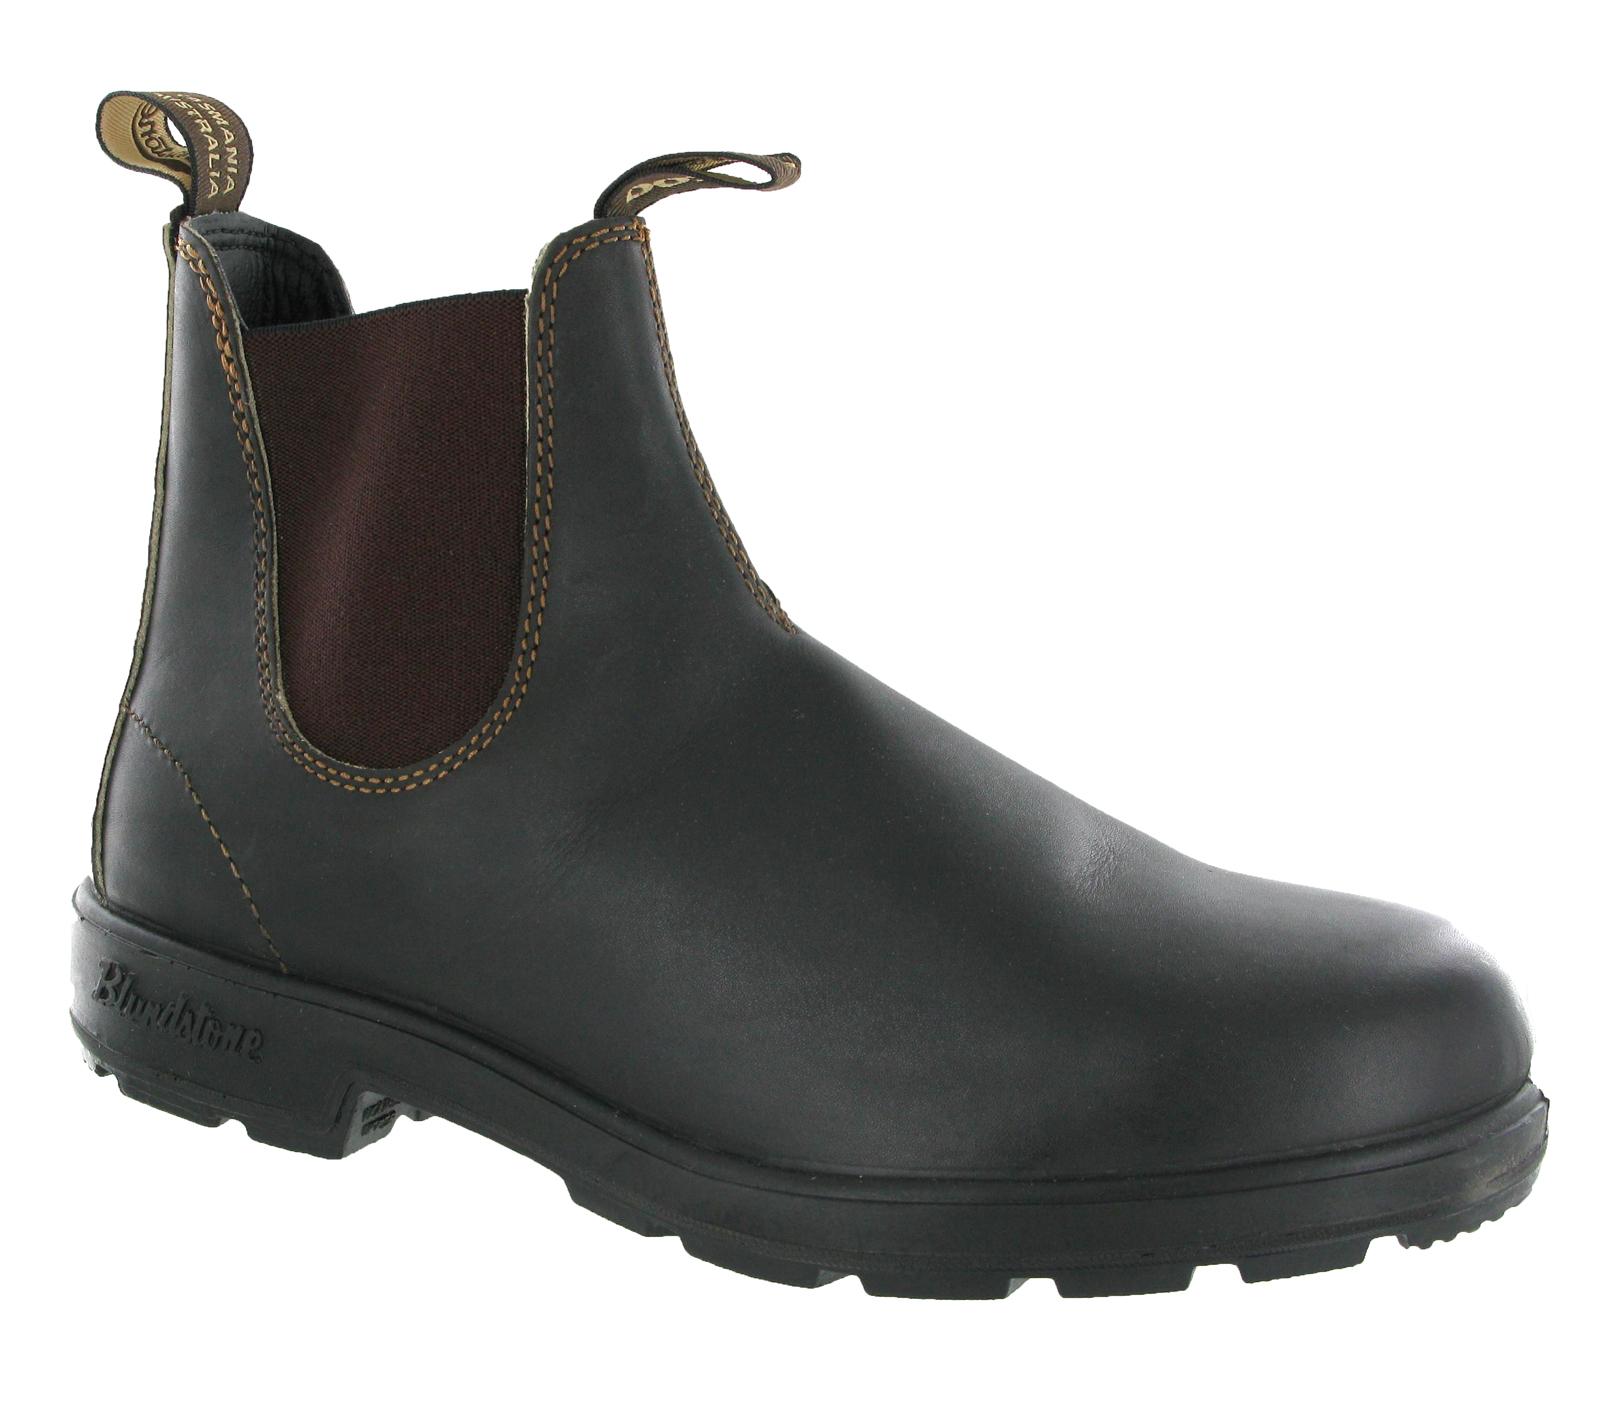 Mens Blundstone 500 Stout Brown Premium Leather Chelsea